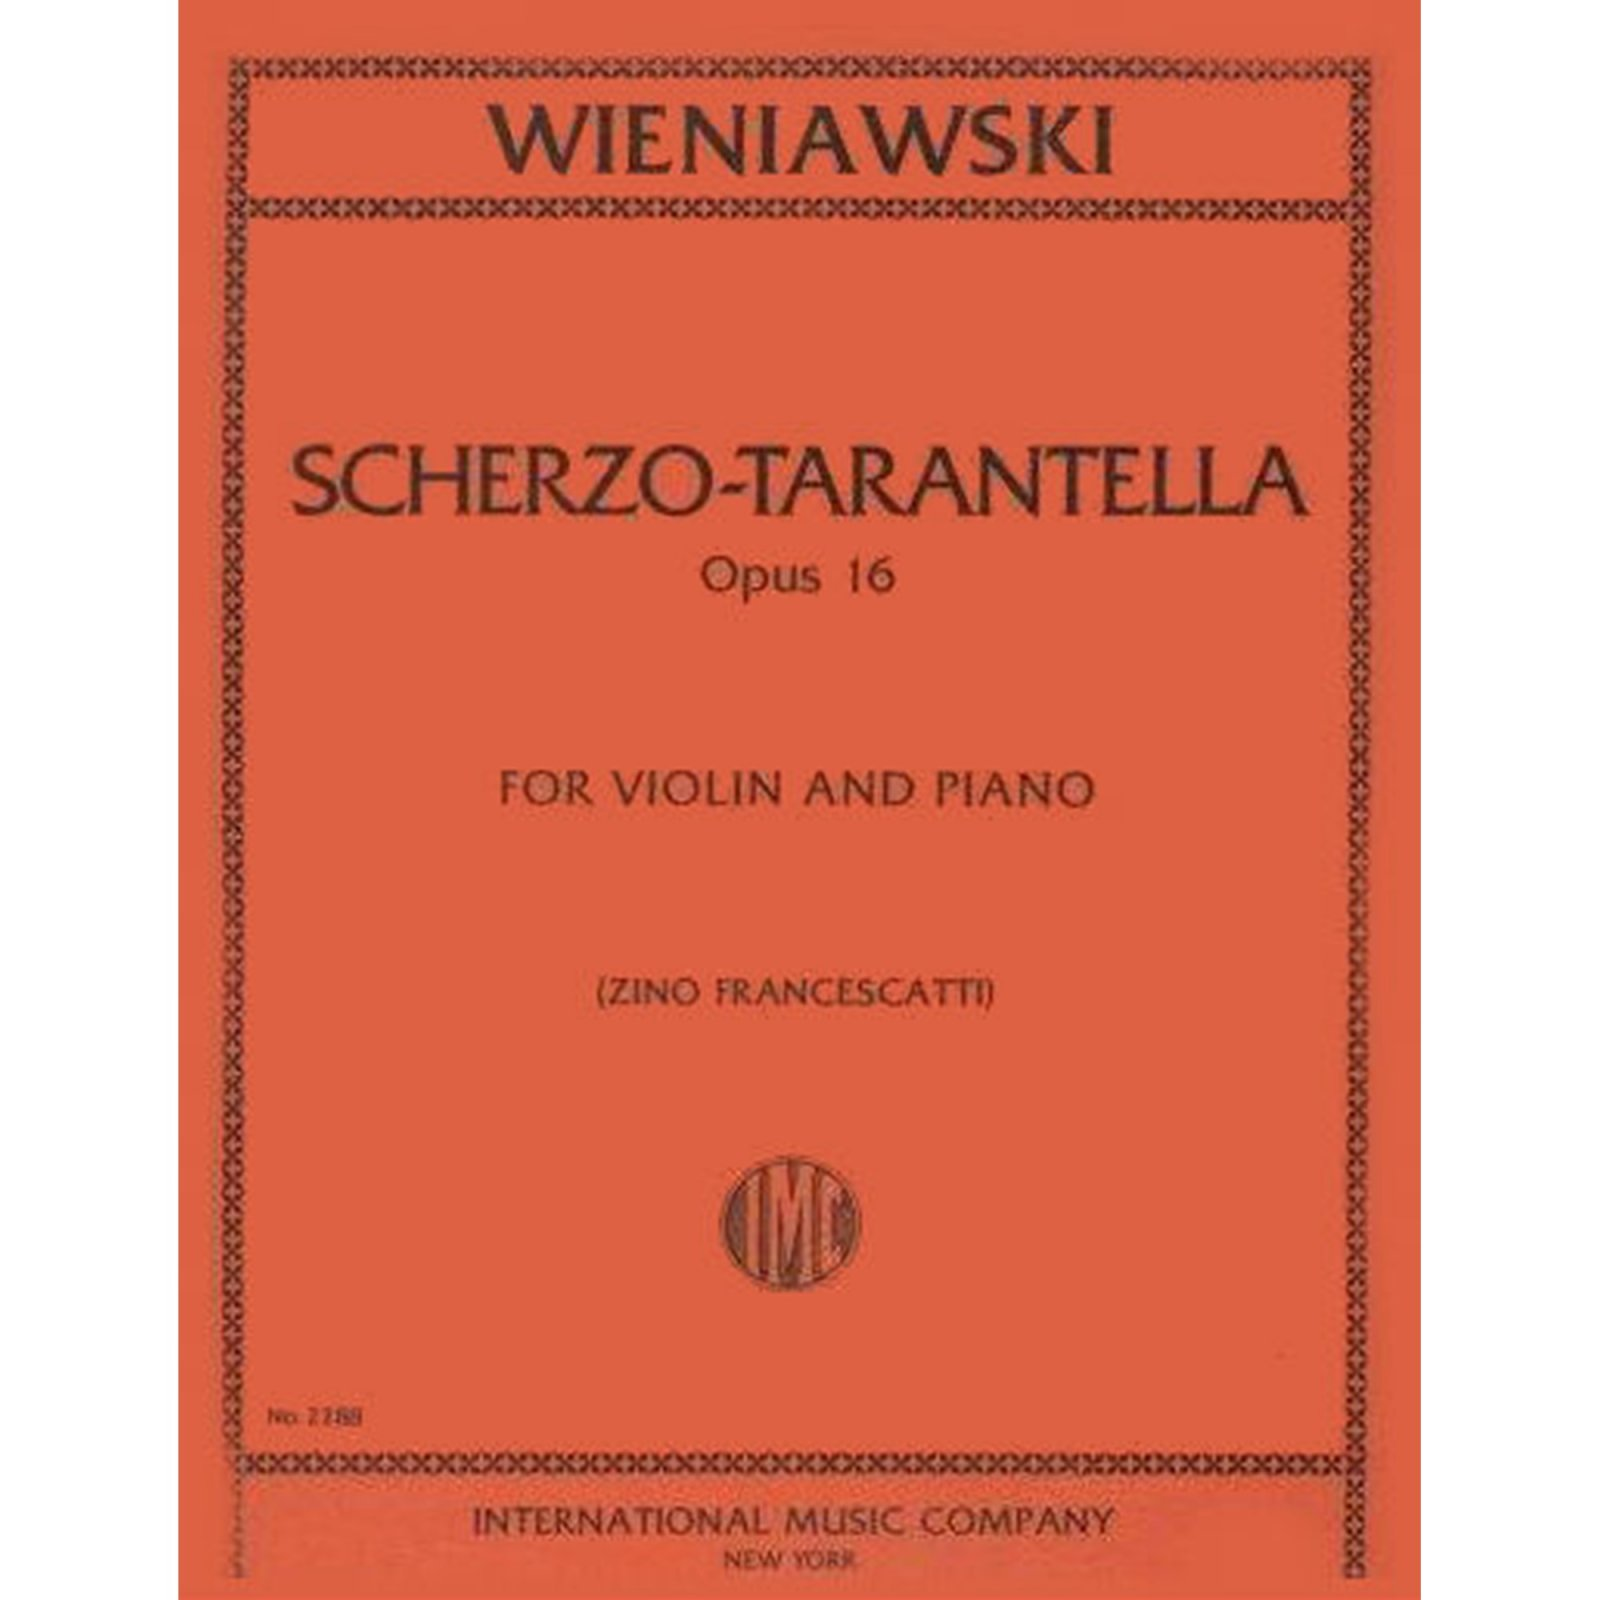 Wieniawski: Scherzo-Tarantella, Op. 16, Ed. Francescatti (International)